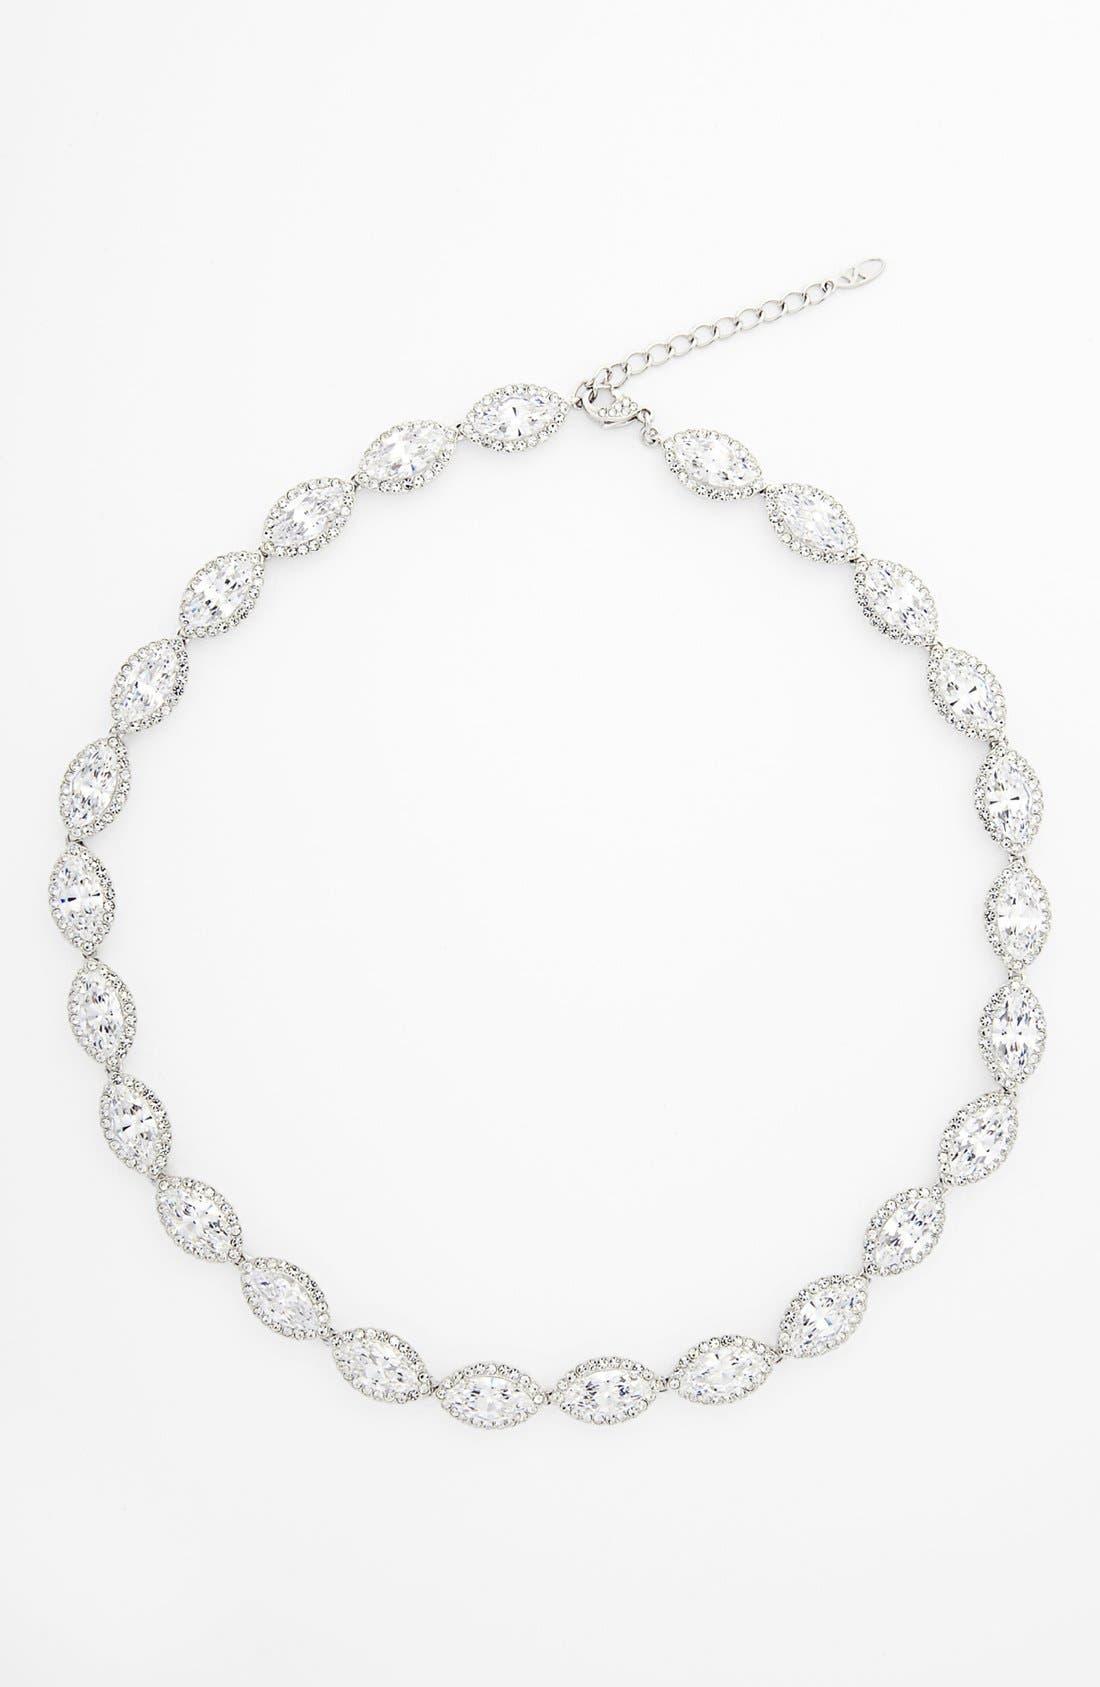 Main Image - Nadri 'Marquise' Cubic Zirconia Necklace